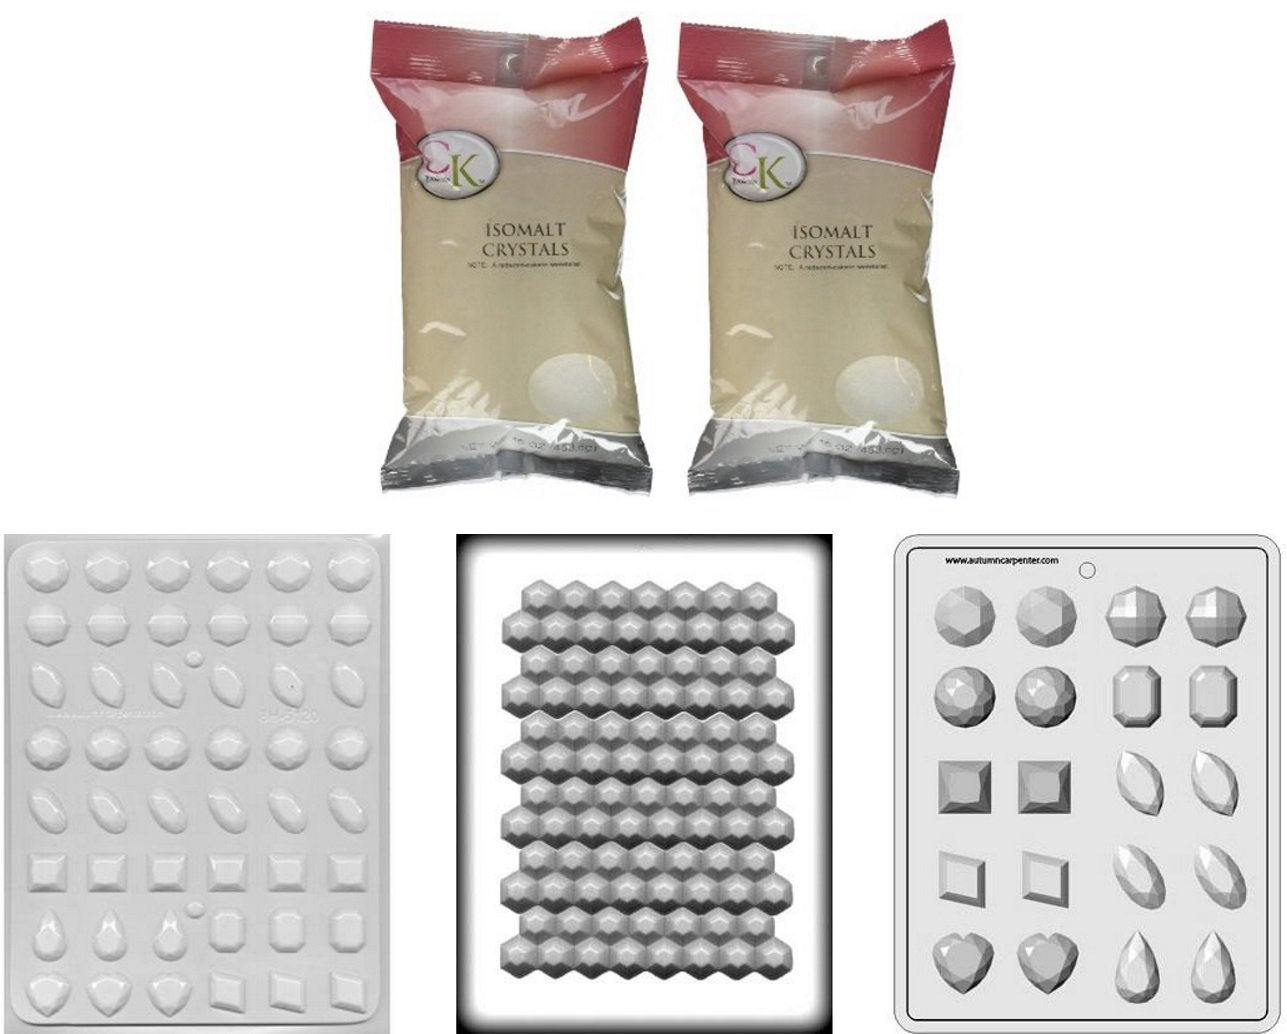 Isomalt Crystals with 3 Jewel Gem Molds - Large, Medium, and Break-apart Hard Candy Molds by Taradactile (Image #1)